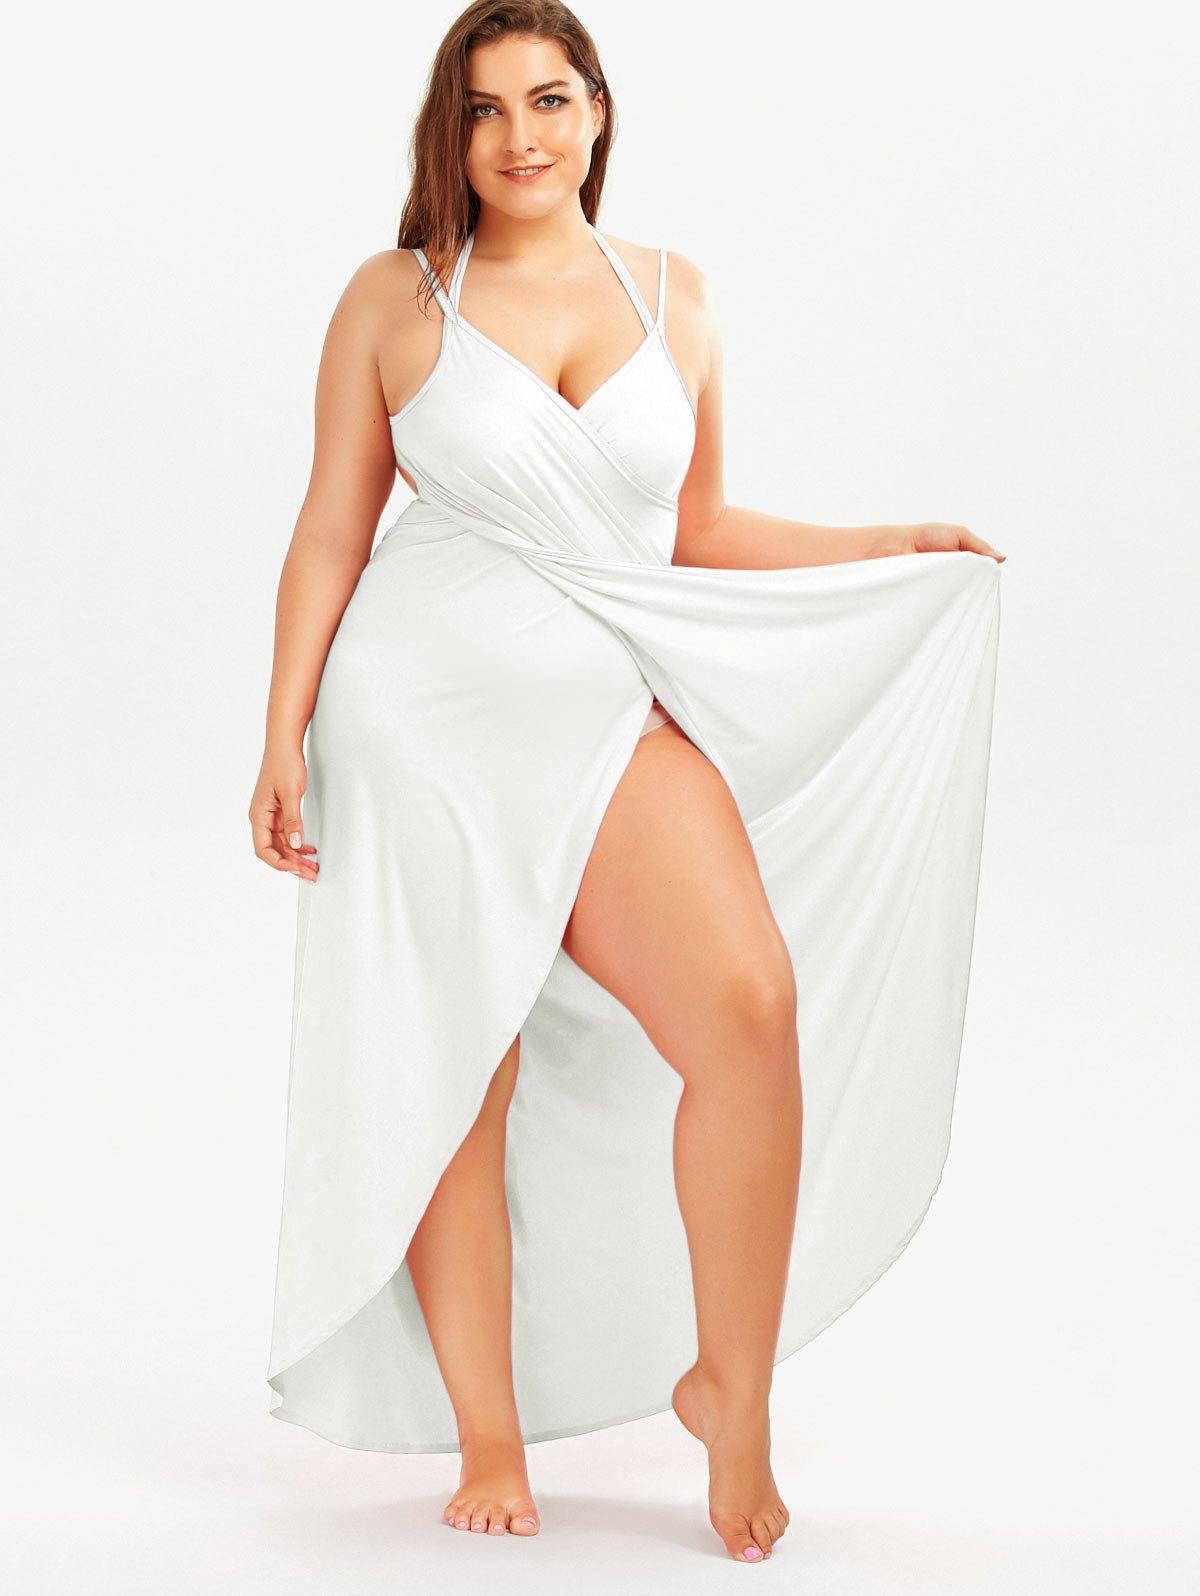 Big Size Womens Beach Dress Sleeveless Sleeveless Casual Cover Up Dress